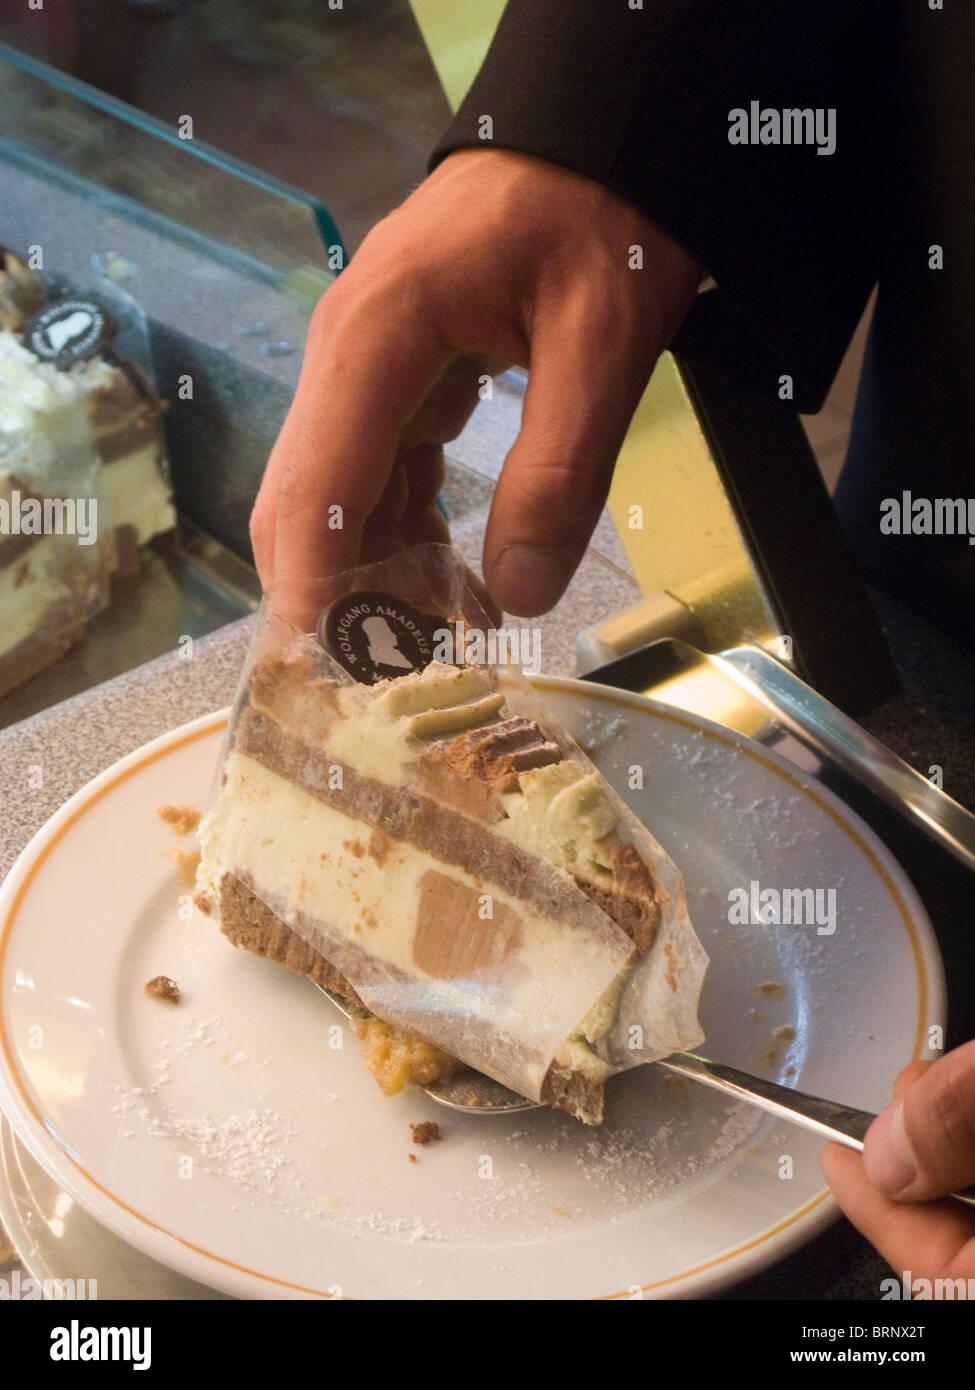 Waiter serving a delicious cake. Cafe Mozart, Vienna, Austria - Stock Image